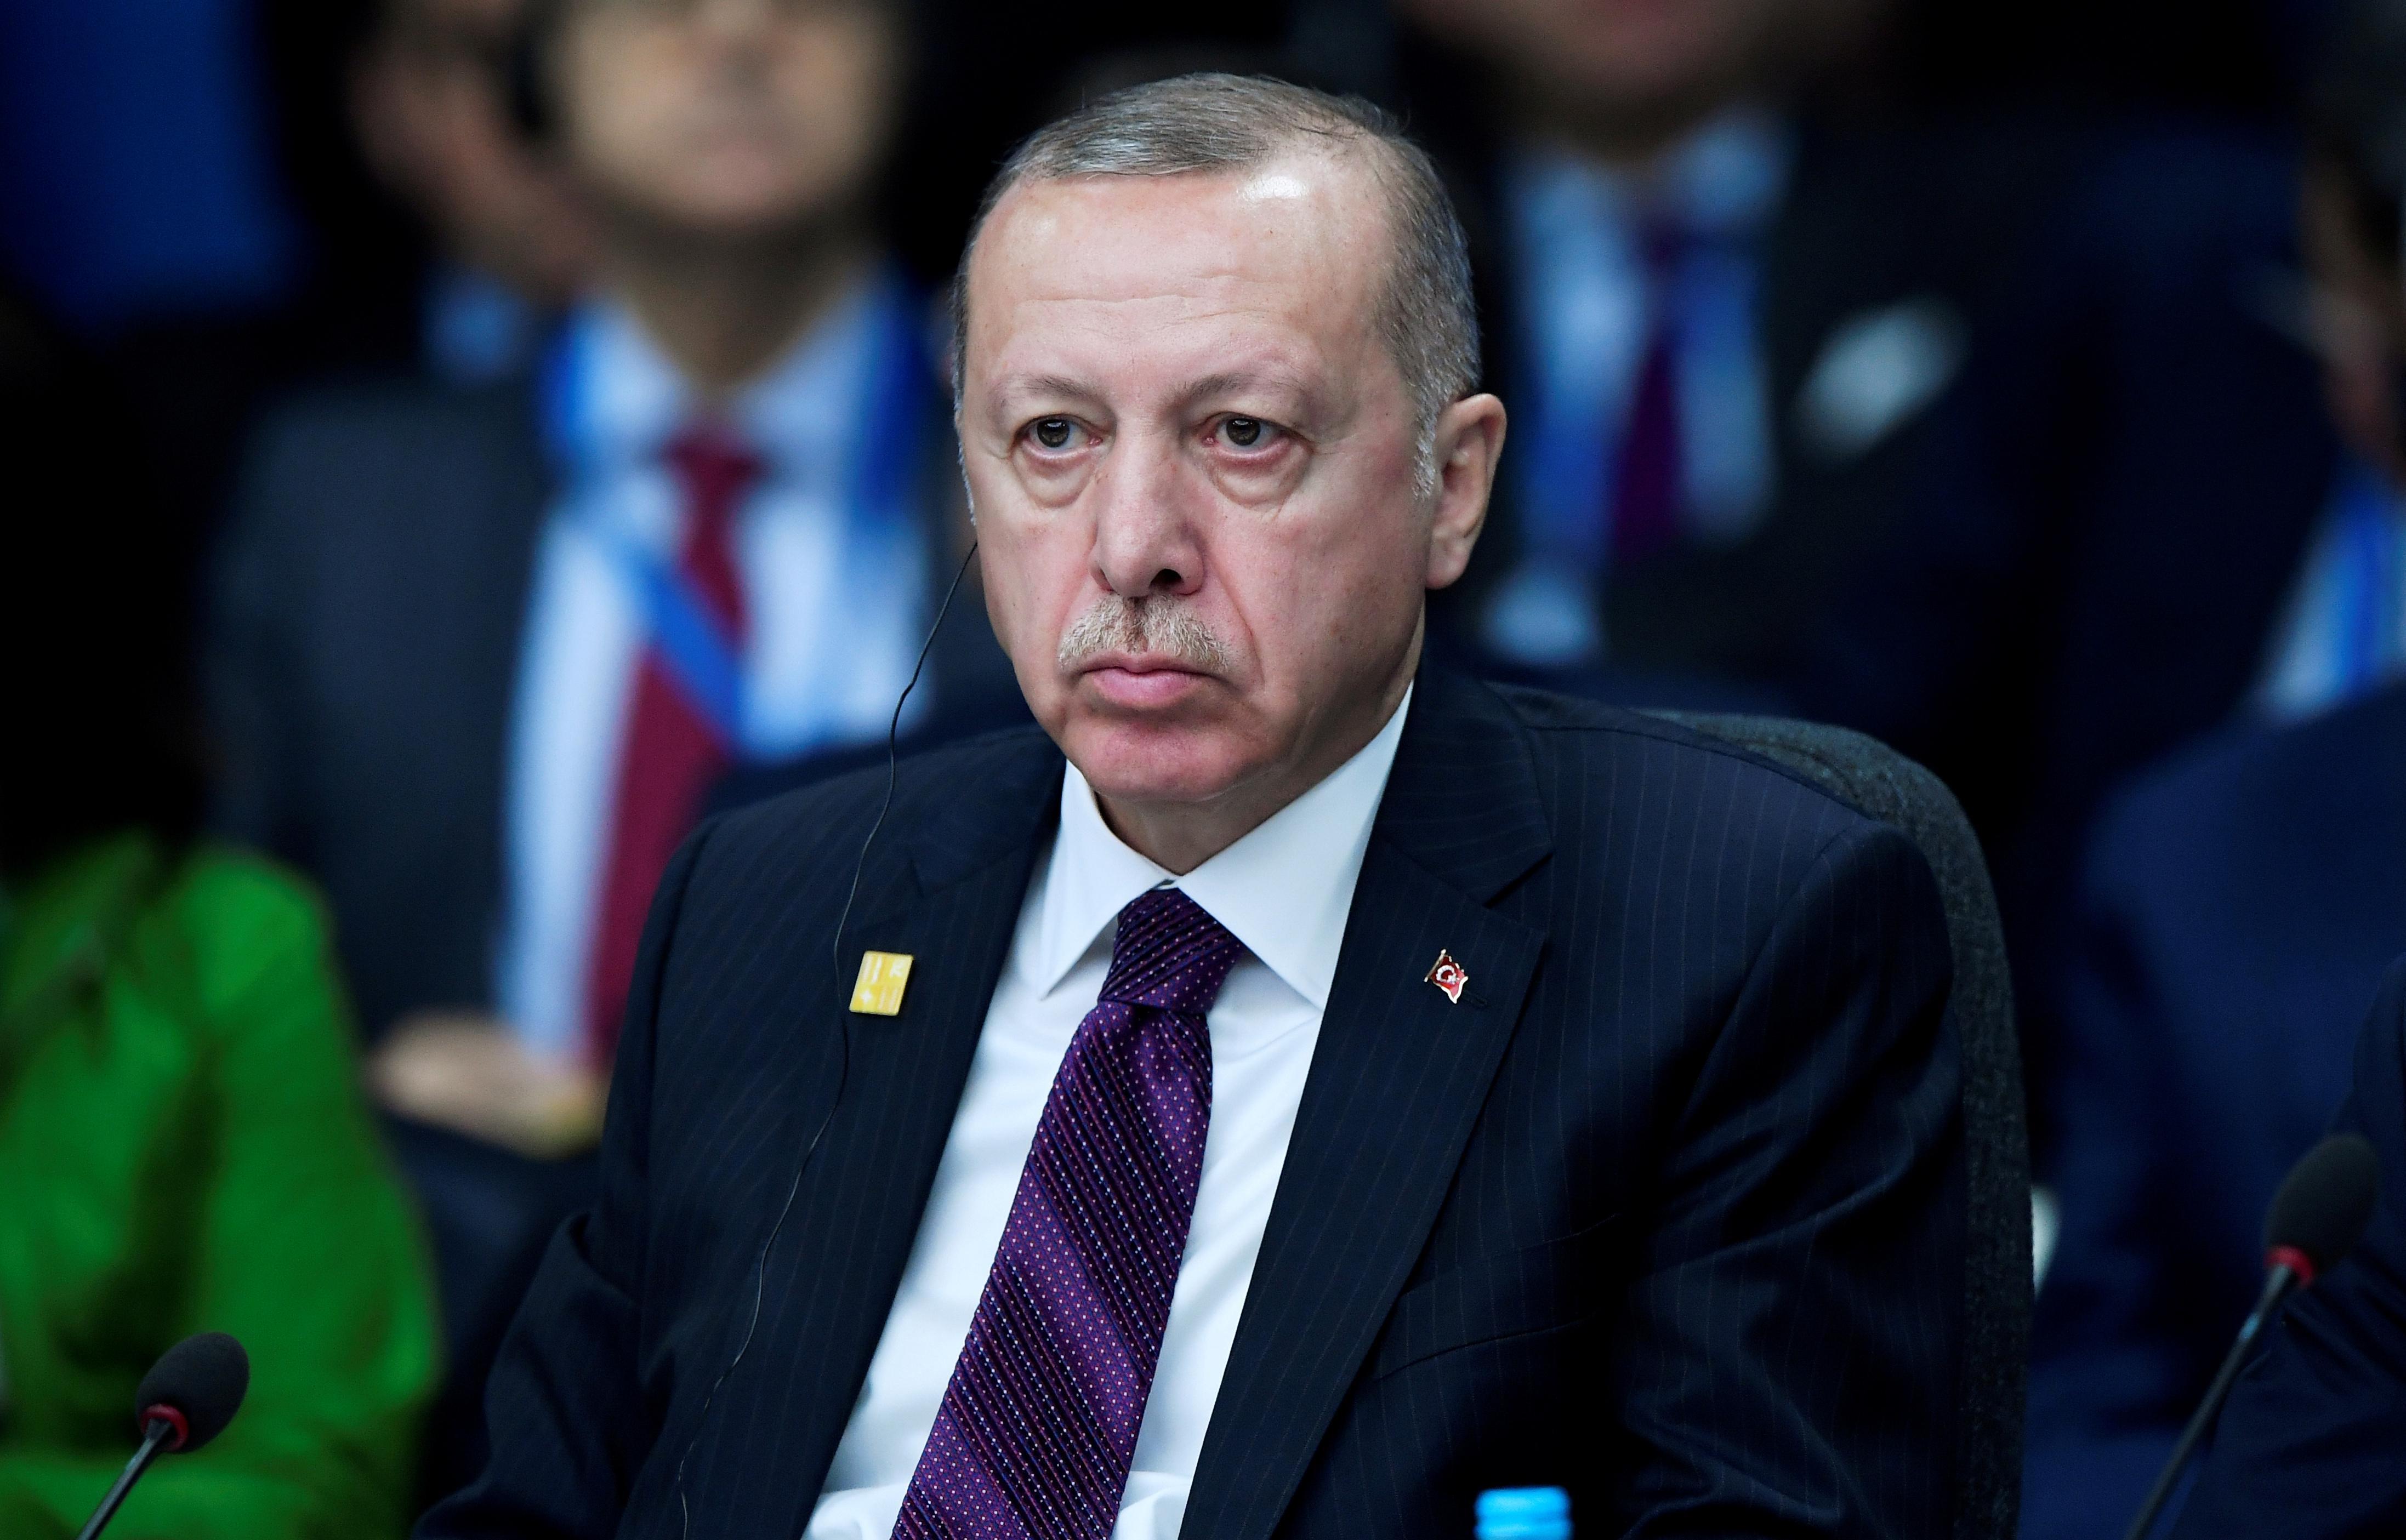 Turkey's Erdogan says Nobel academy rewarding human rights violations